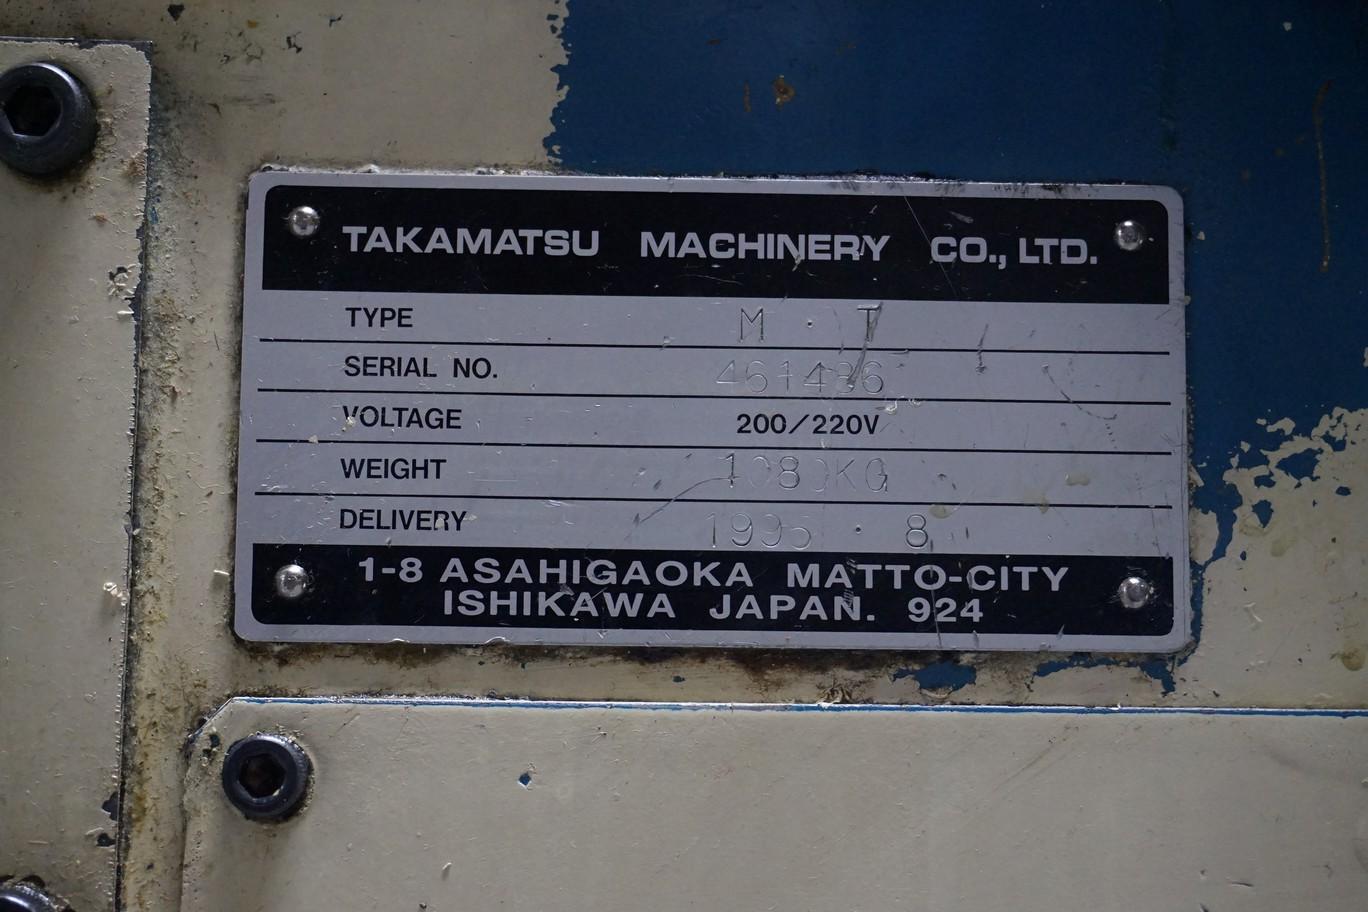 Takamatsu Model MT CNC Lathe 200/220V c/w Transformer (L66) - Image 5 of 7